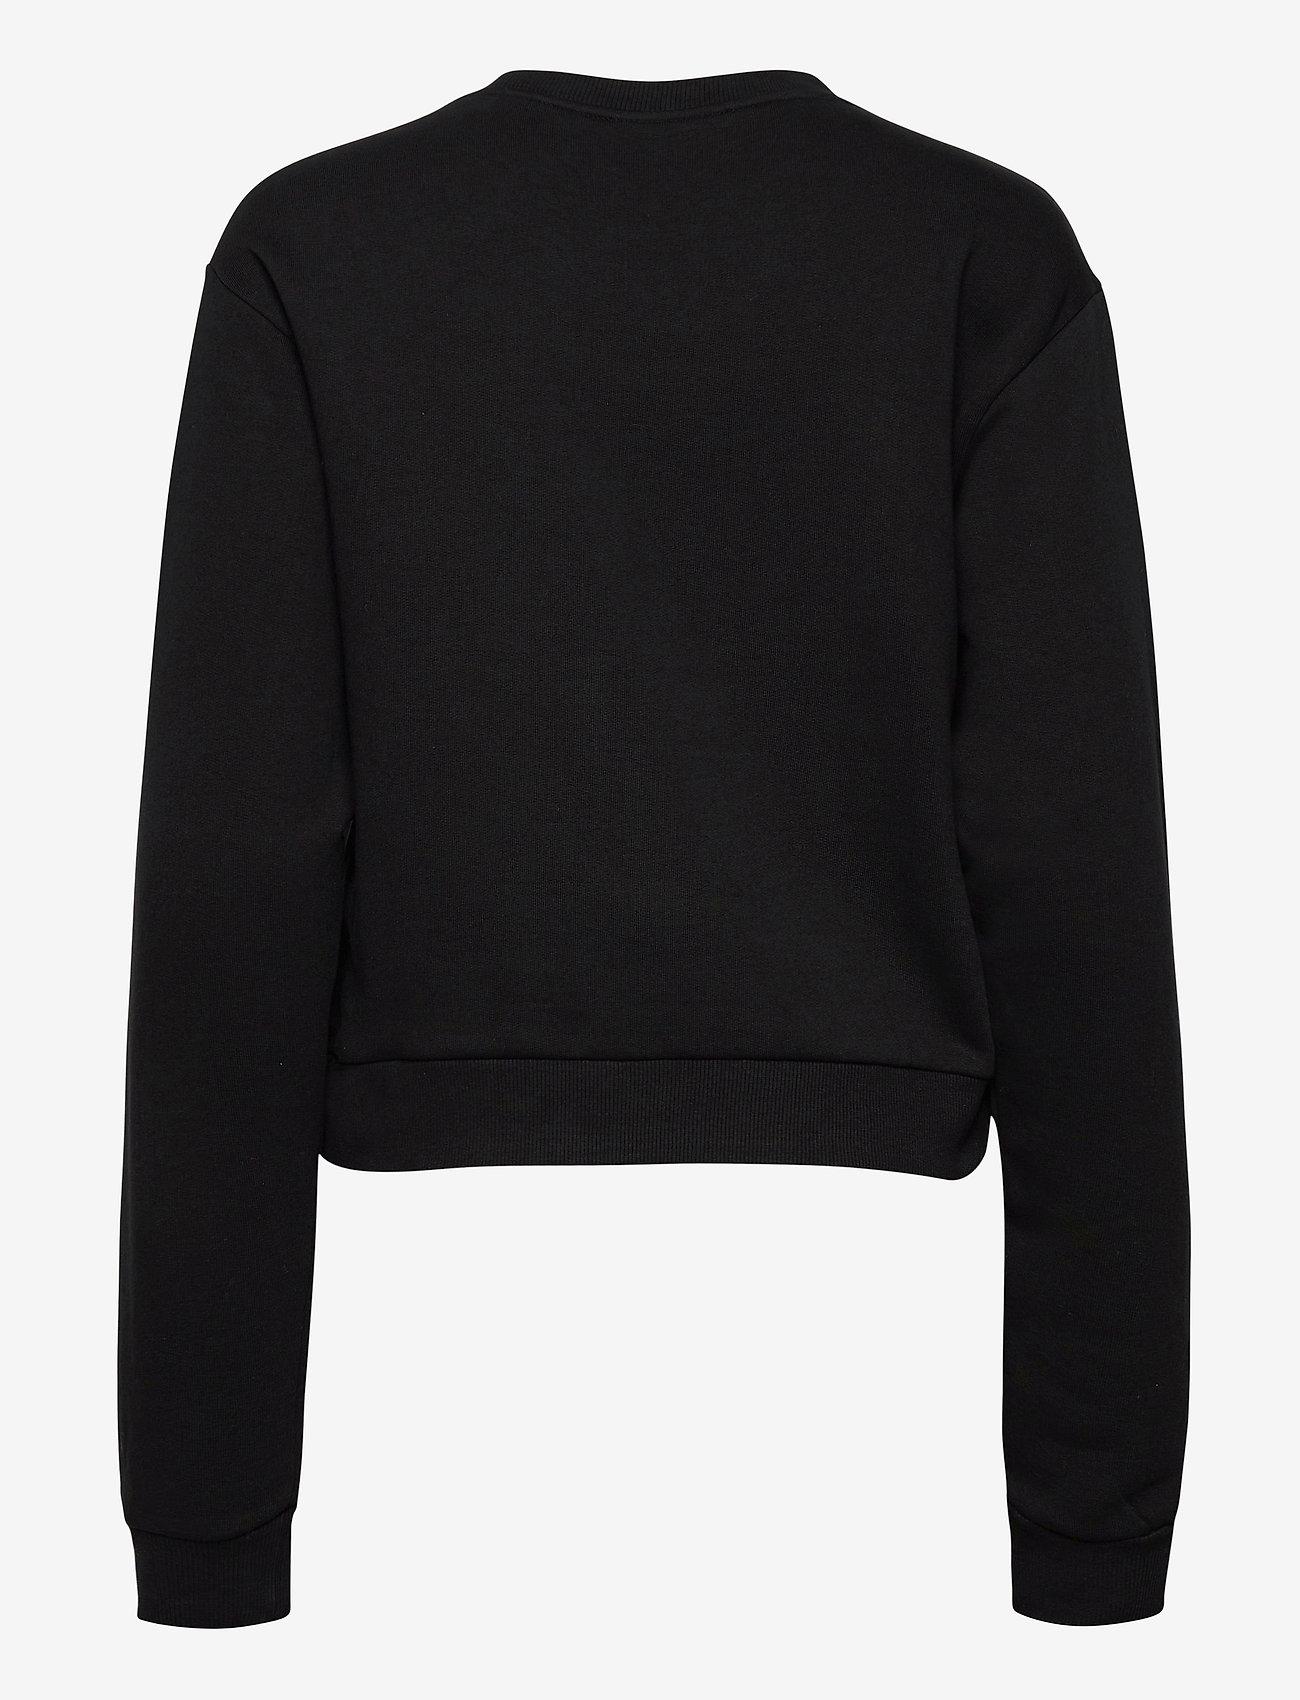 GUESS Jeans - ICON FLEECE - sweatshirts - jet black a996 - 1